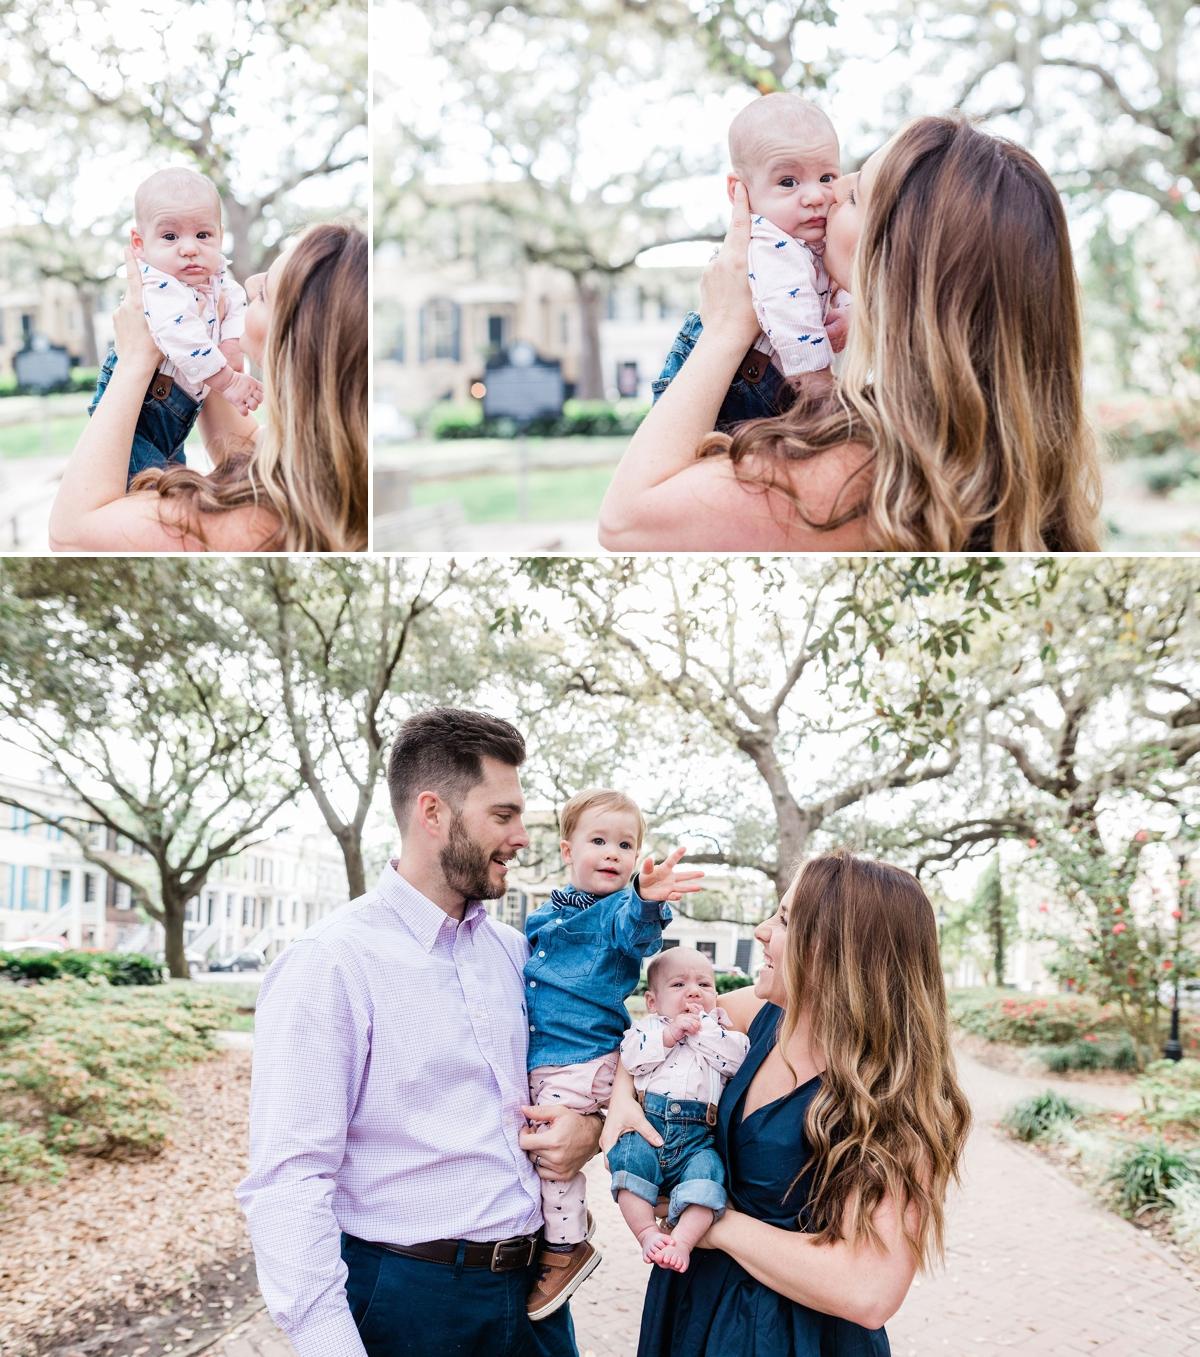 Newborn family session | Savannah Family Photographer